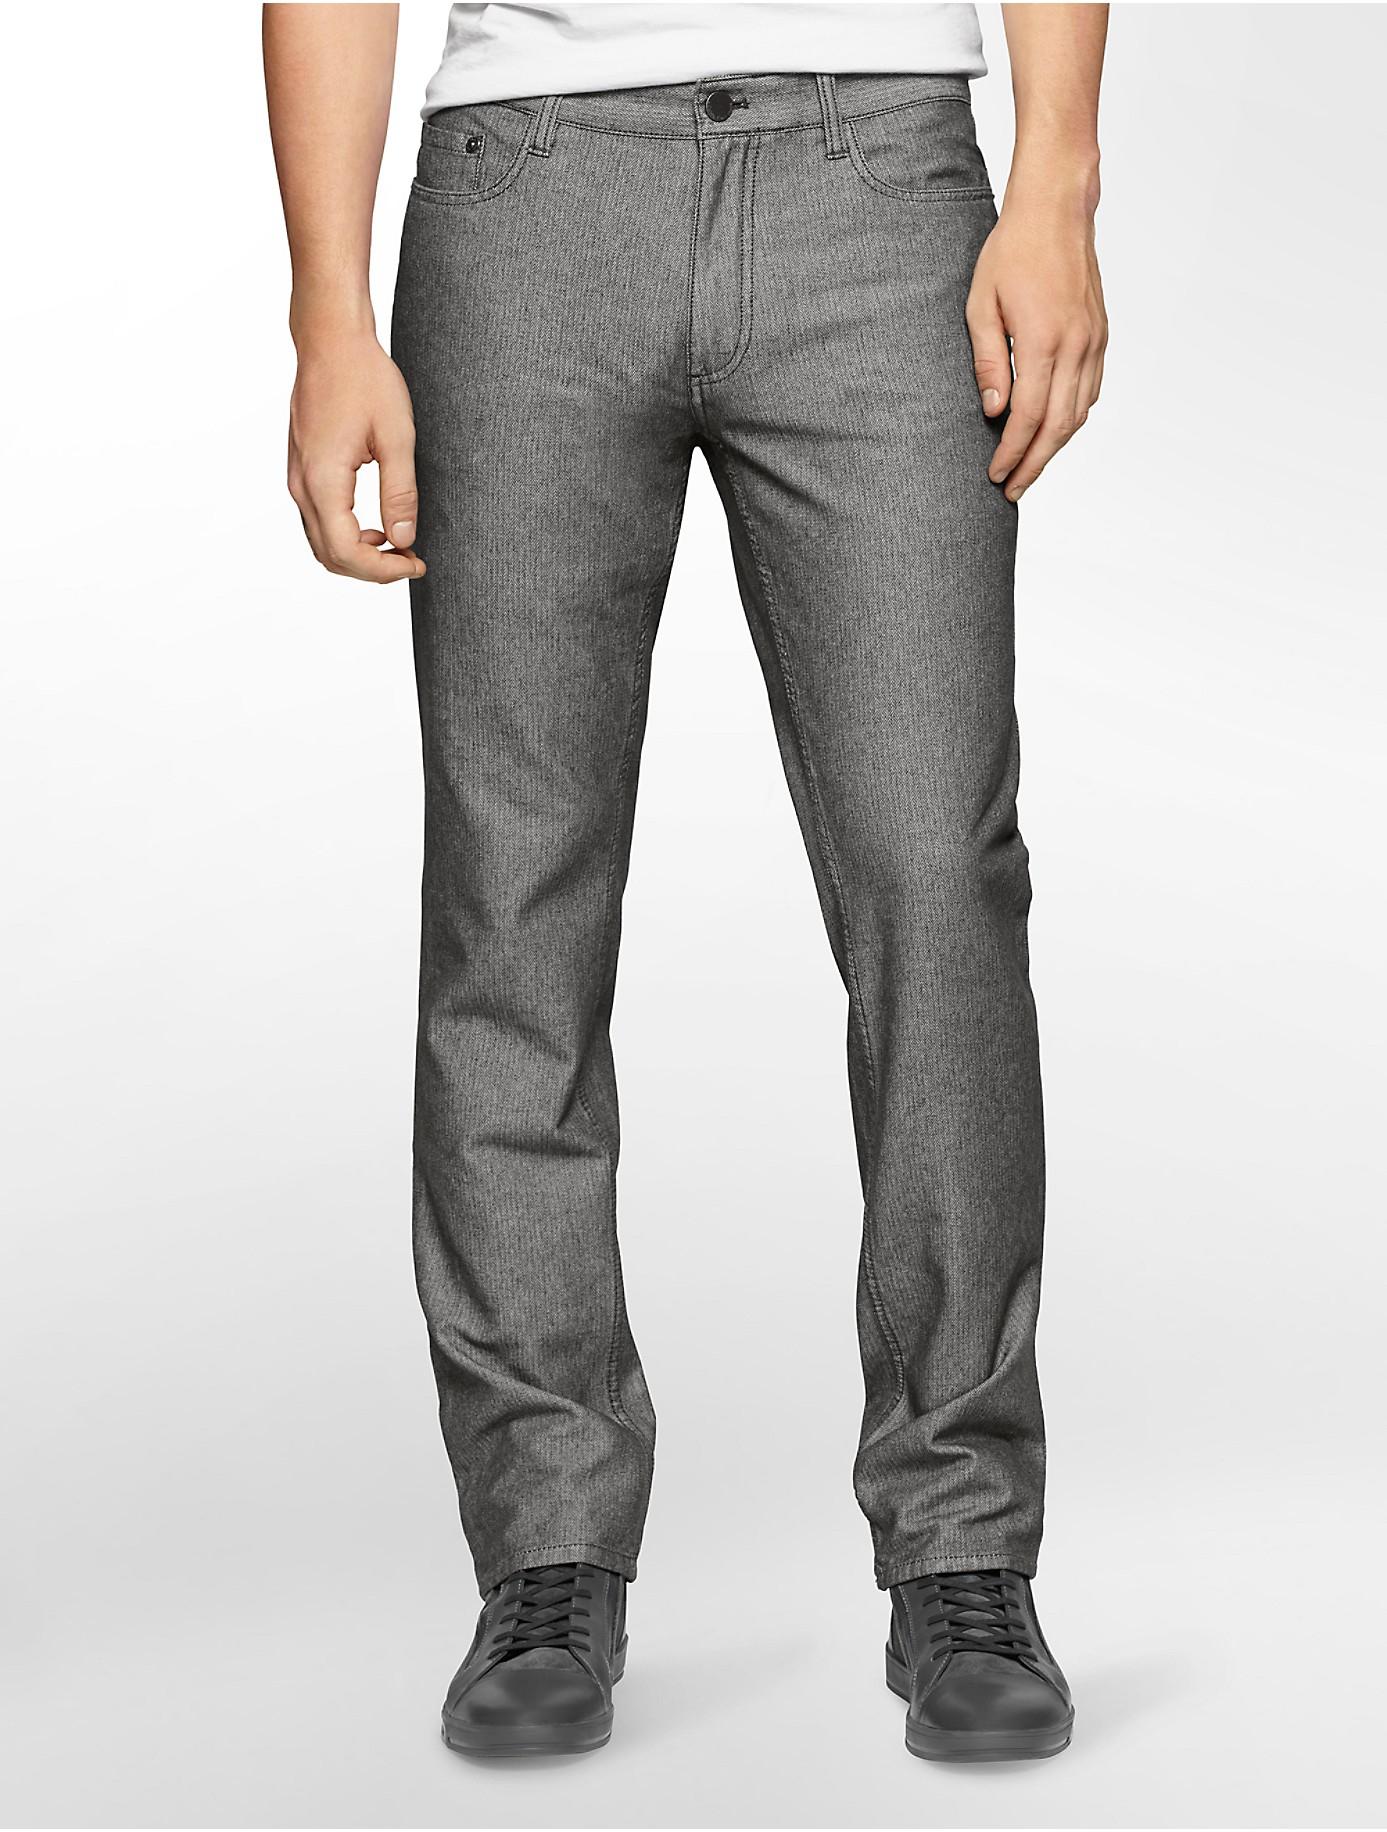 calvin klein jeans slim straight leg herringbone jeans in. Black Bedroom Furniture Sets. Home Design Ideas